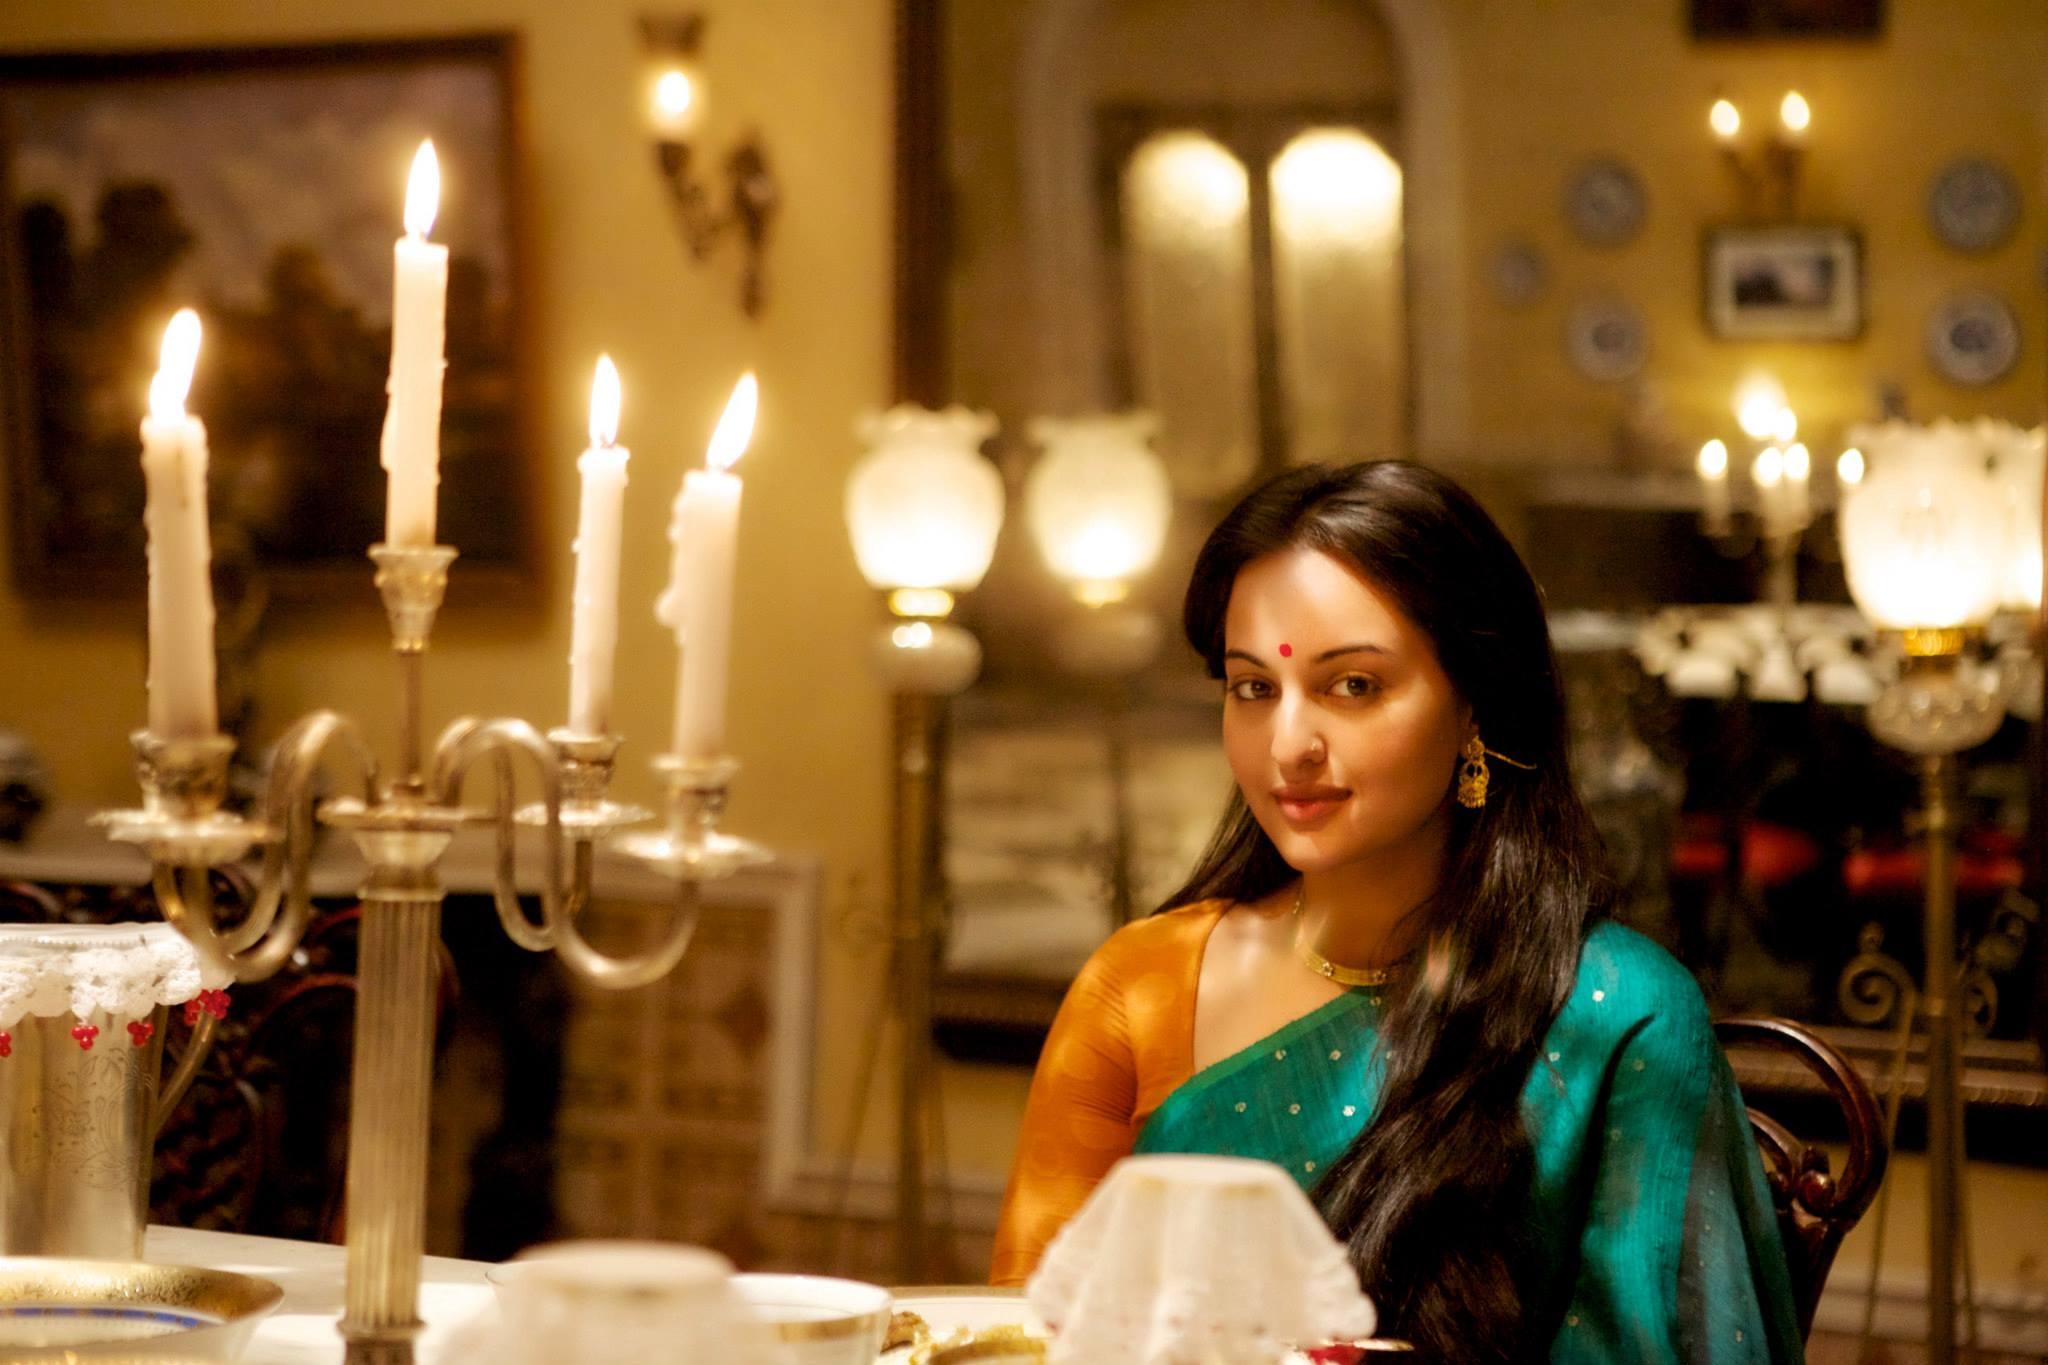 Sonakshi Sinha is a revelation